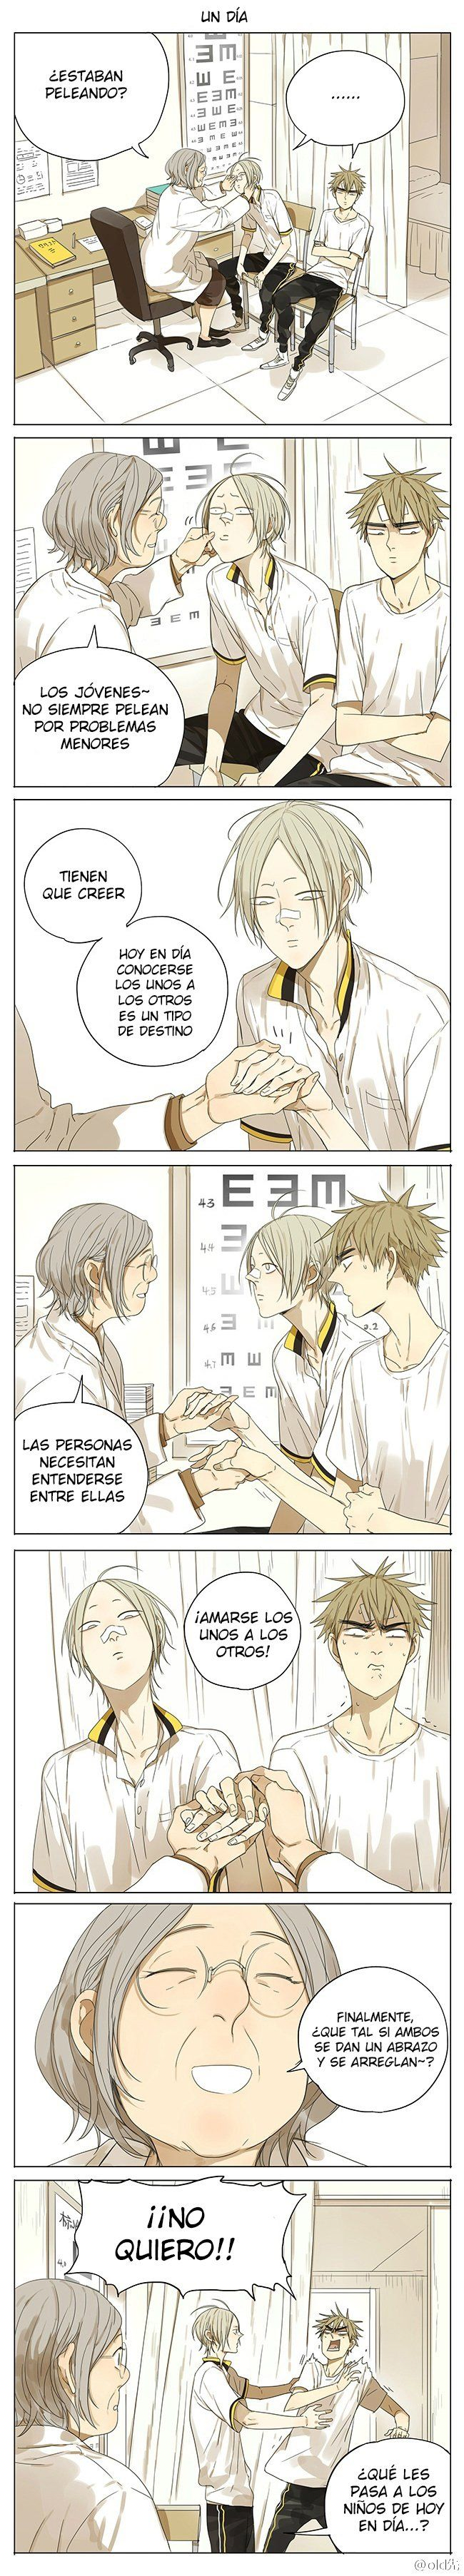 19 Days Capítulo 4 página 1 (Cargar imágenes: 10) - Leer Manga en Español gratis en NineManga.com